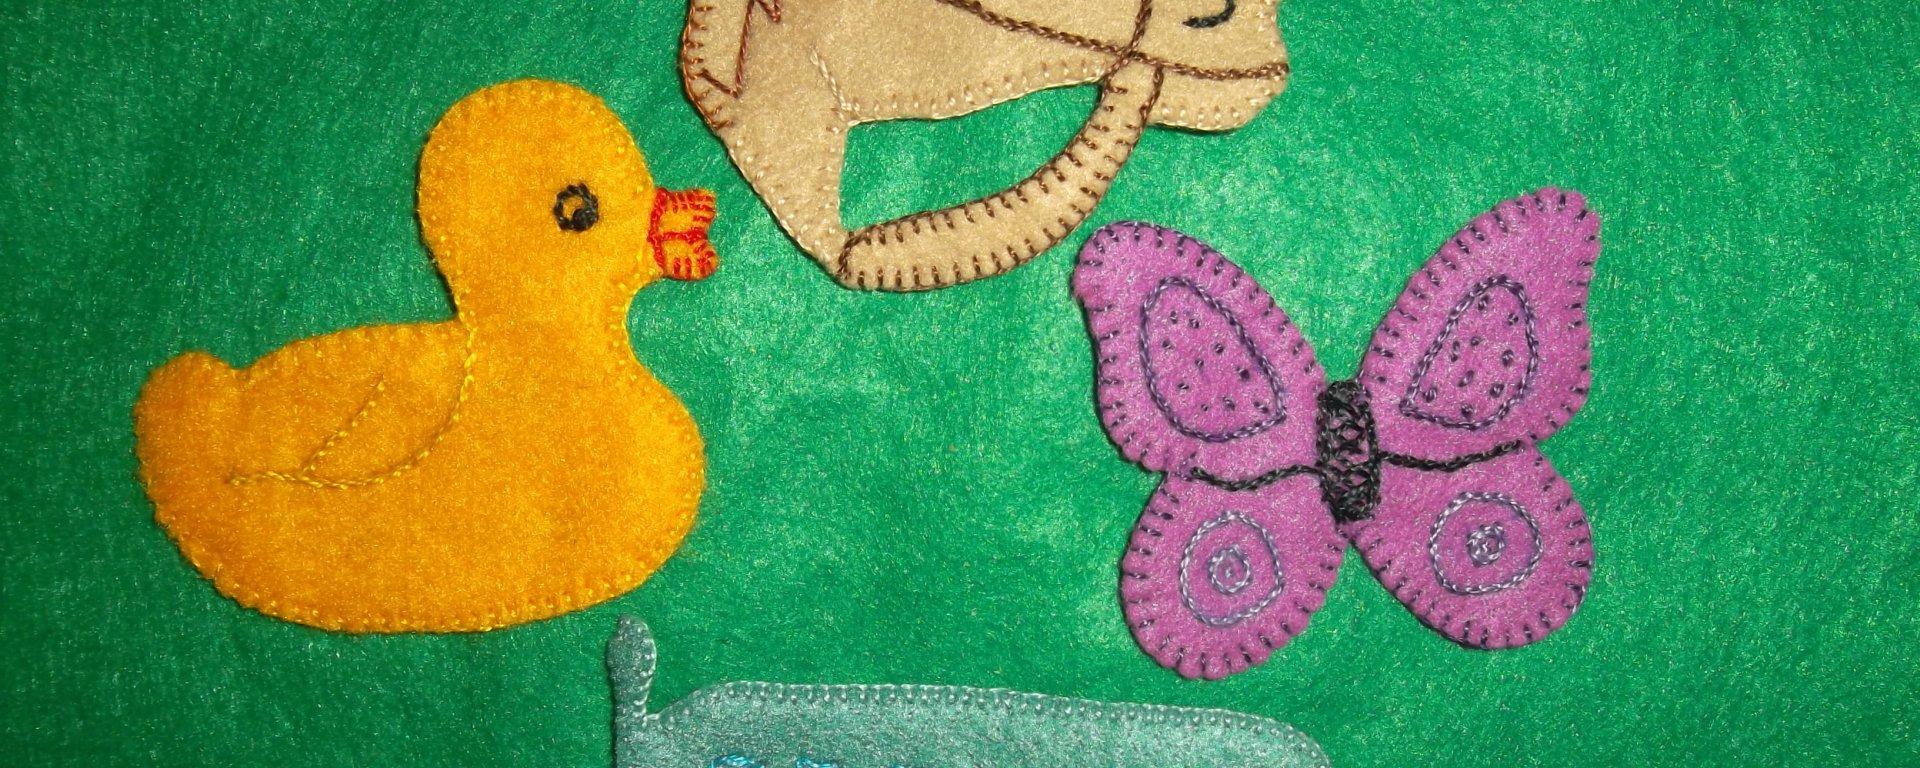 bonecos de feltro para trabalho pedagógico